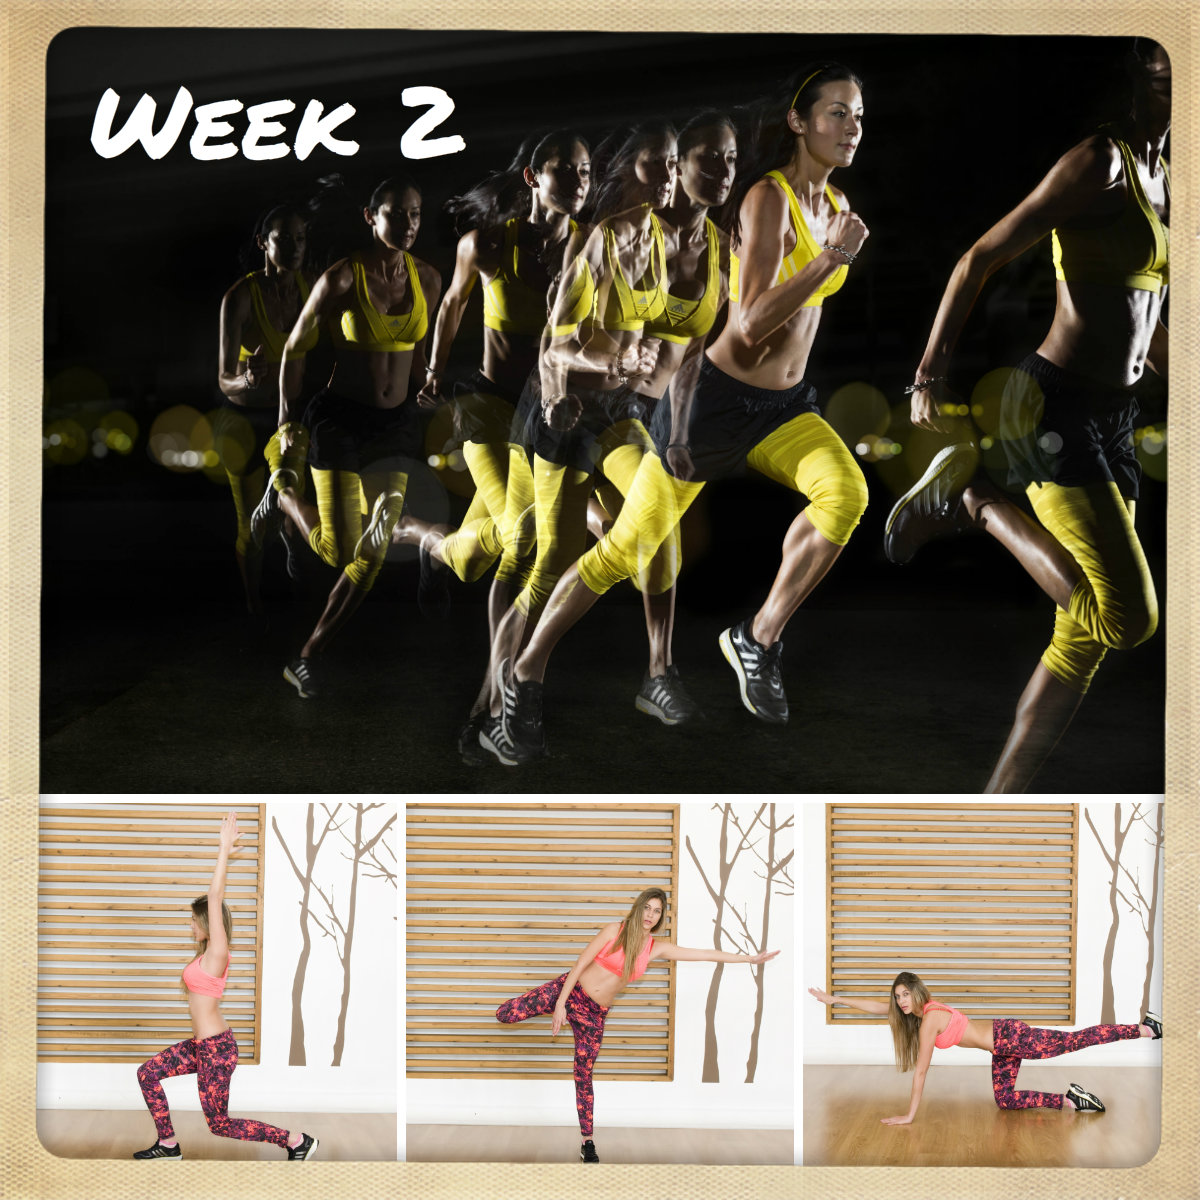 1 | 21 Days For The Perfect Body! Μπες δυο νούμερα στο τζιν! Δεύτερη εβδομάδα